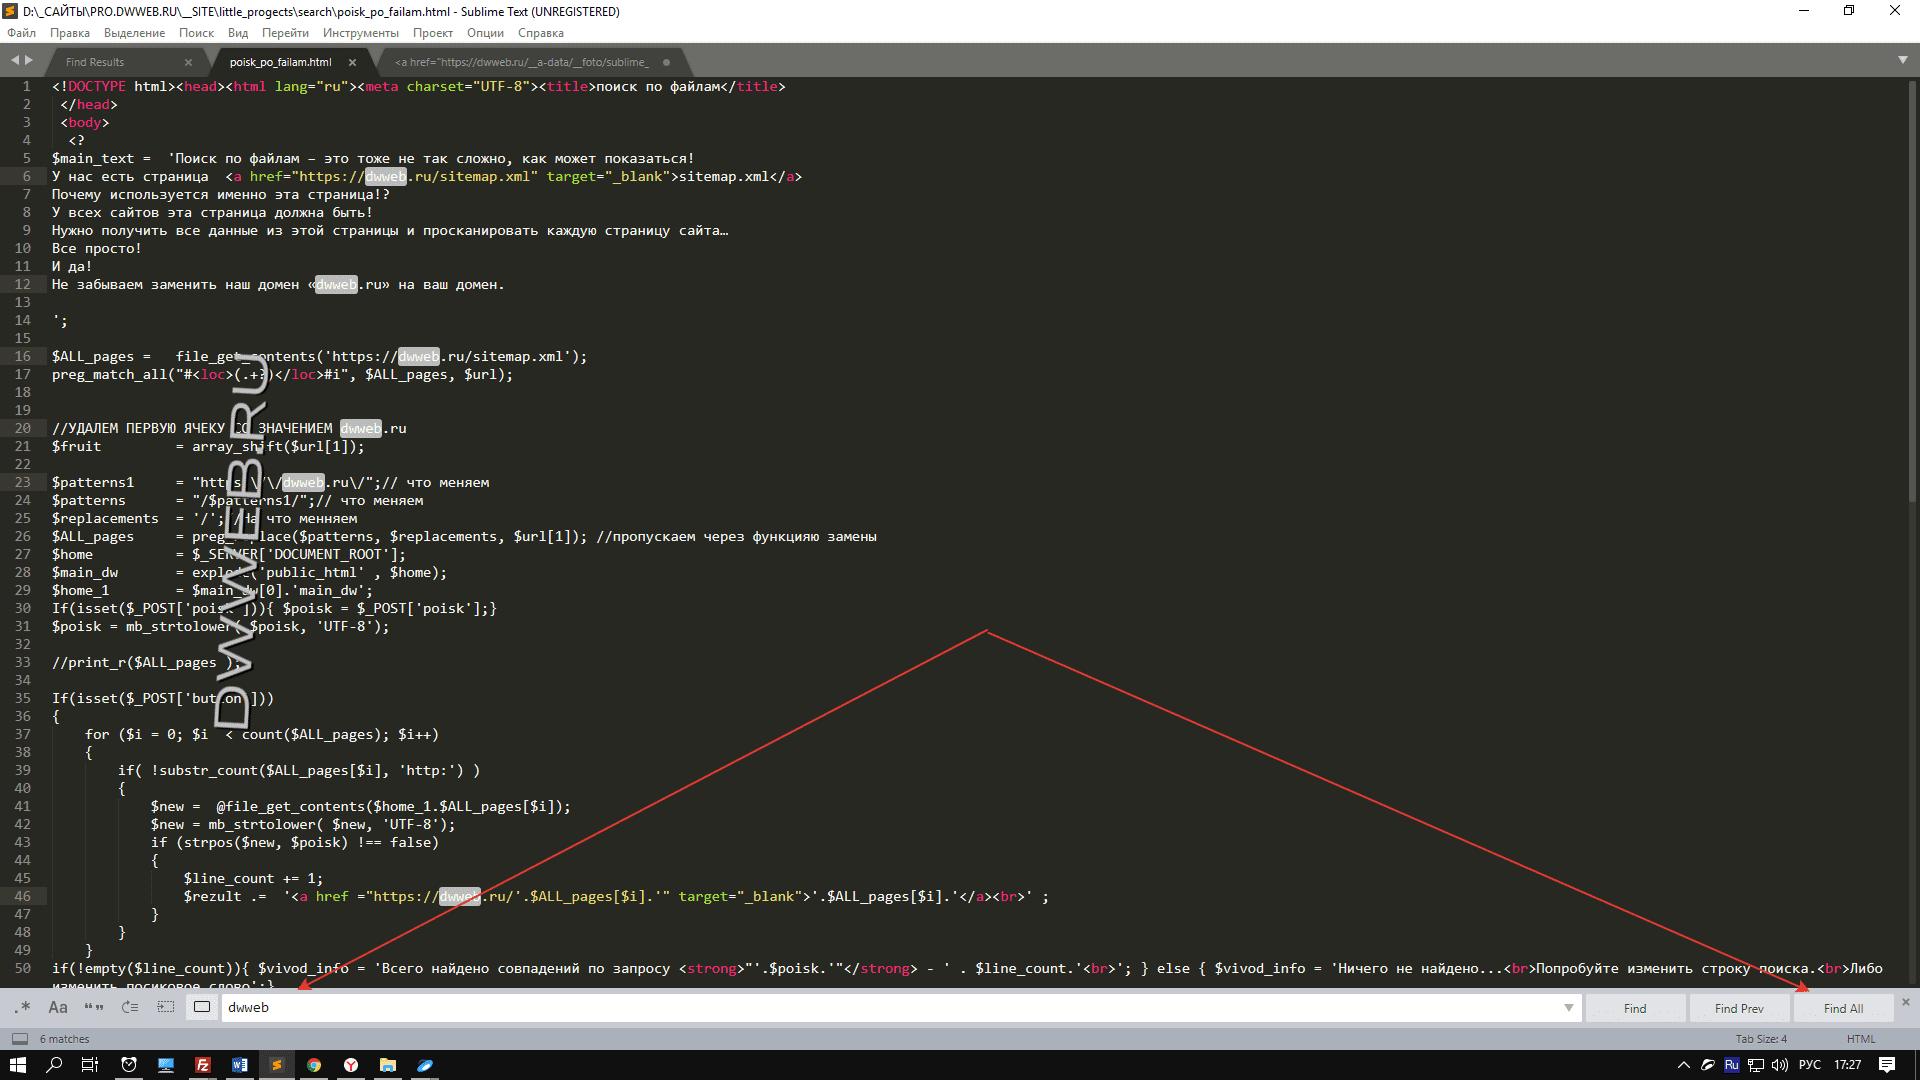 Замена повторяющегося слова в  sublime_text_3